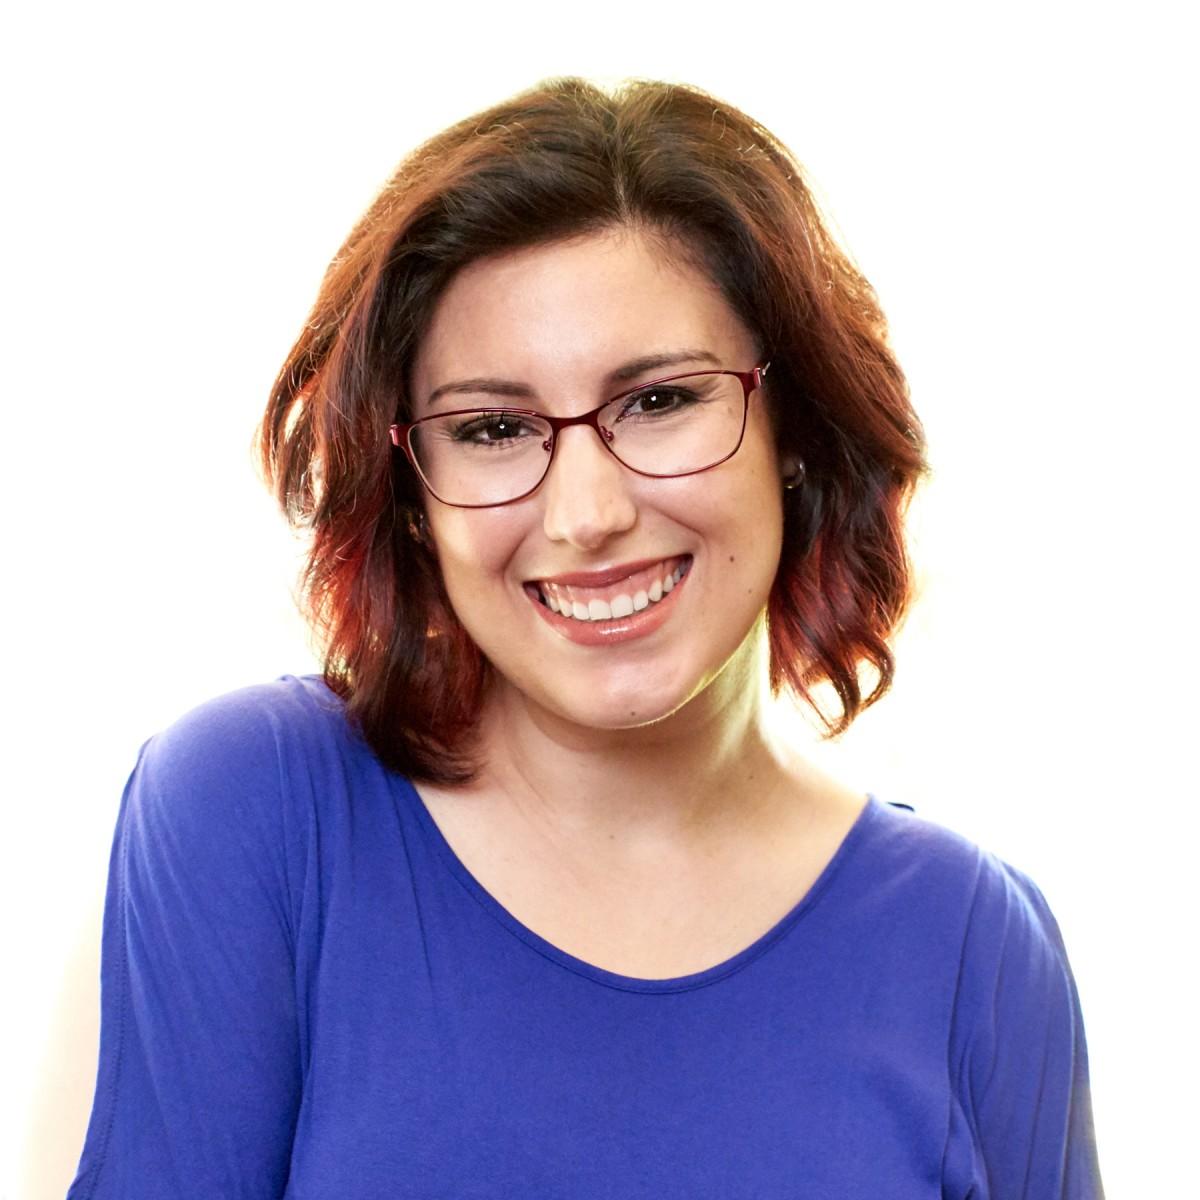 Krystal Craven